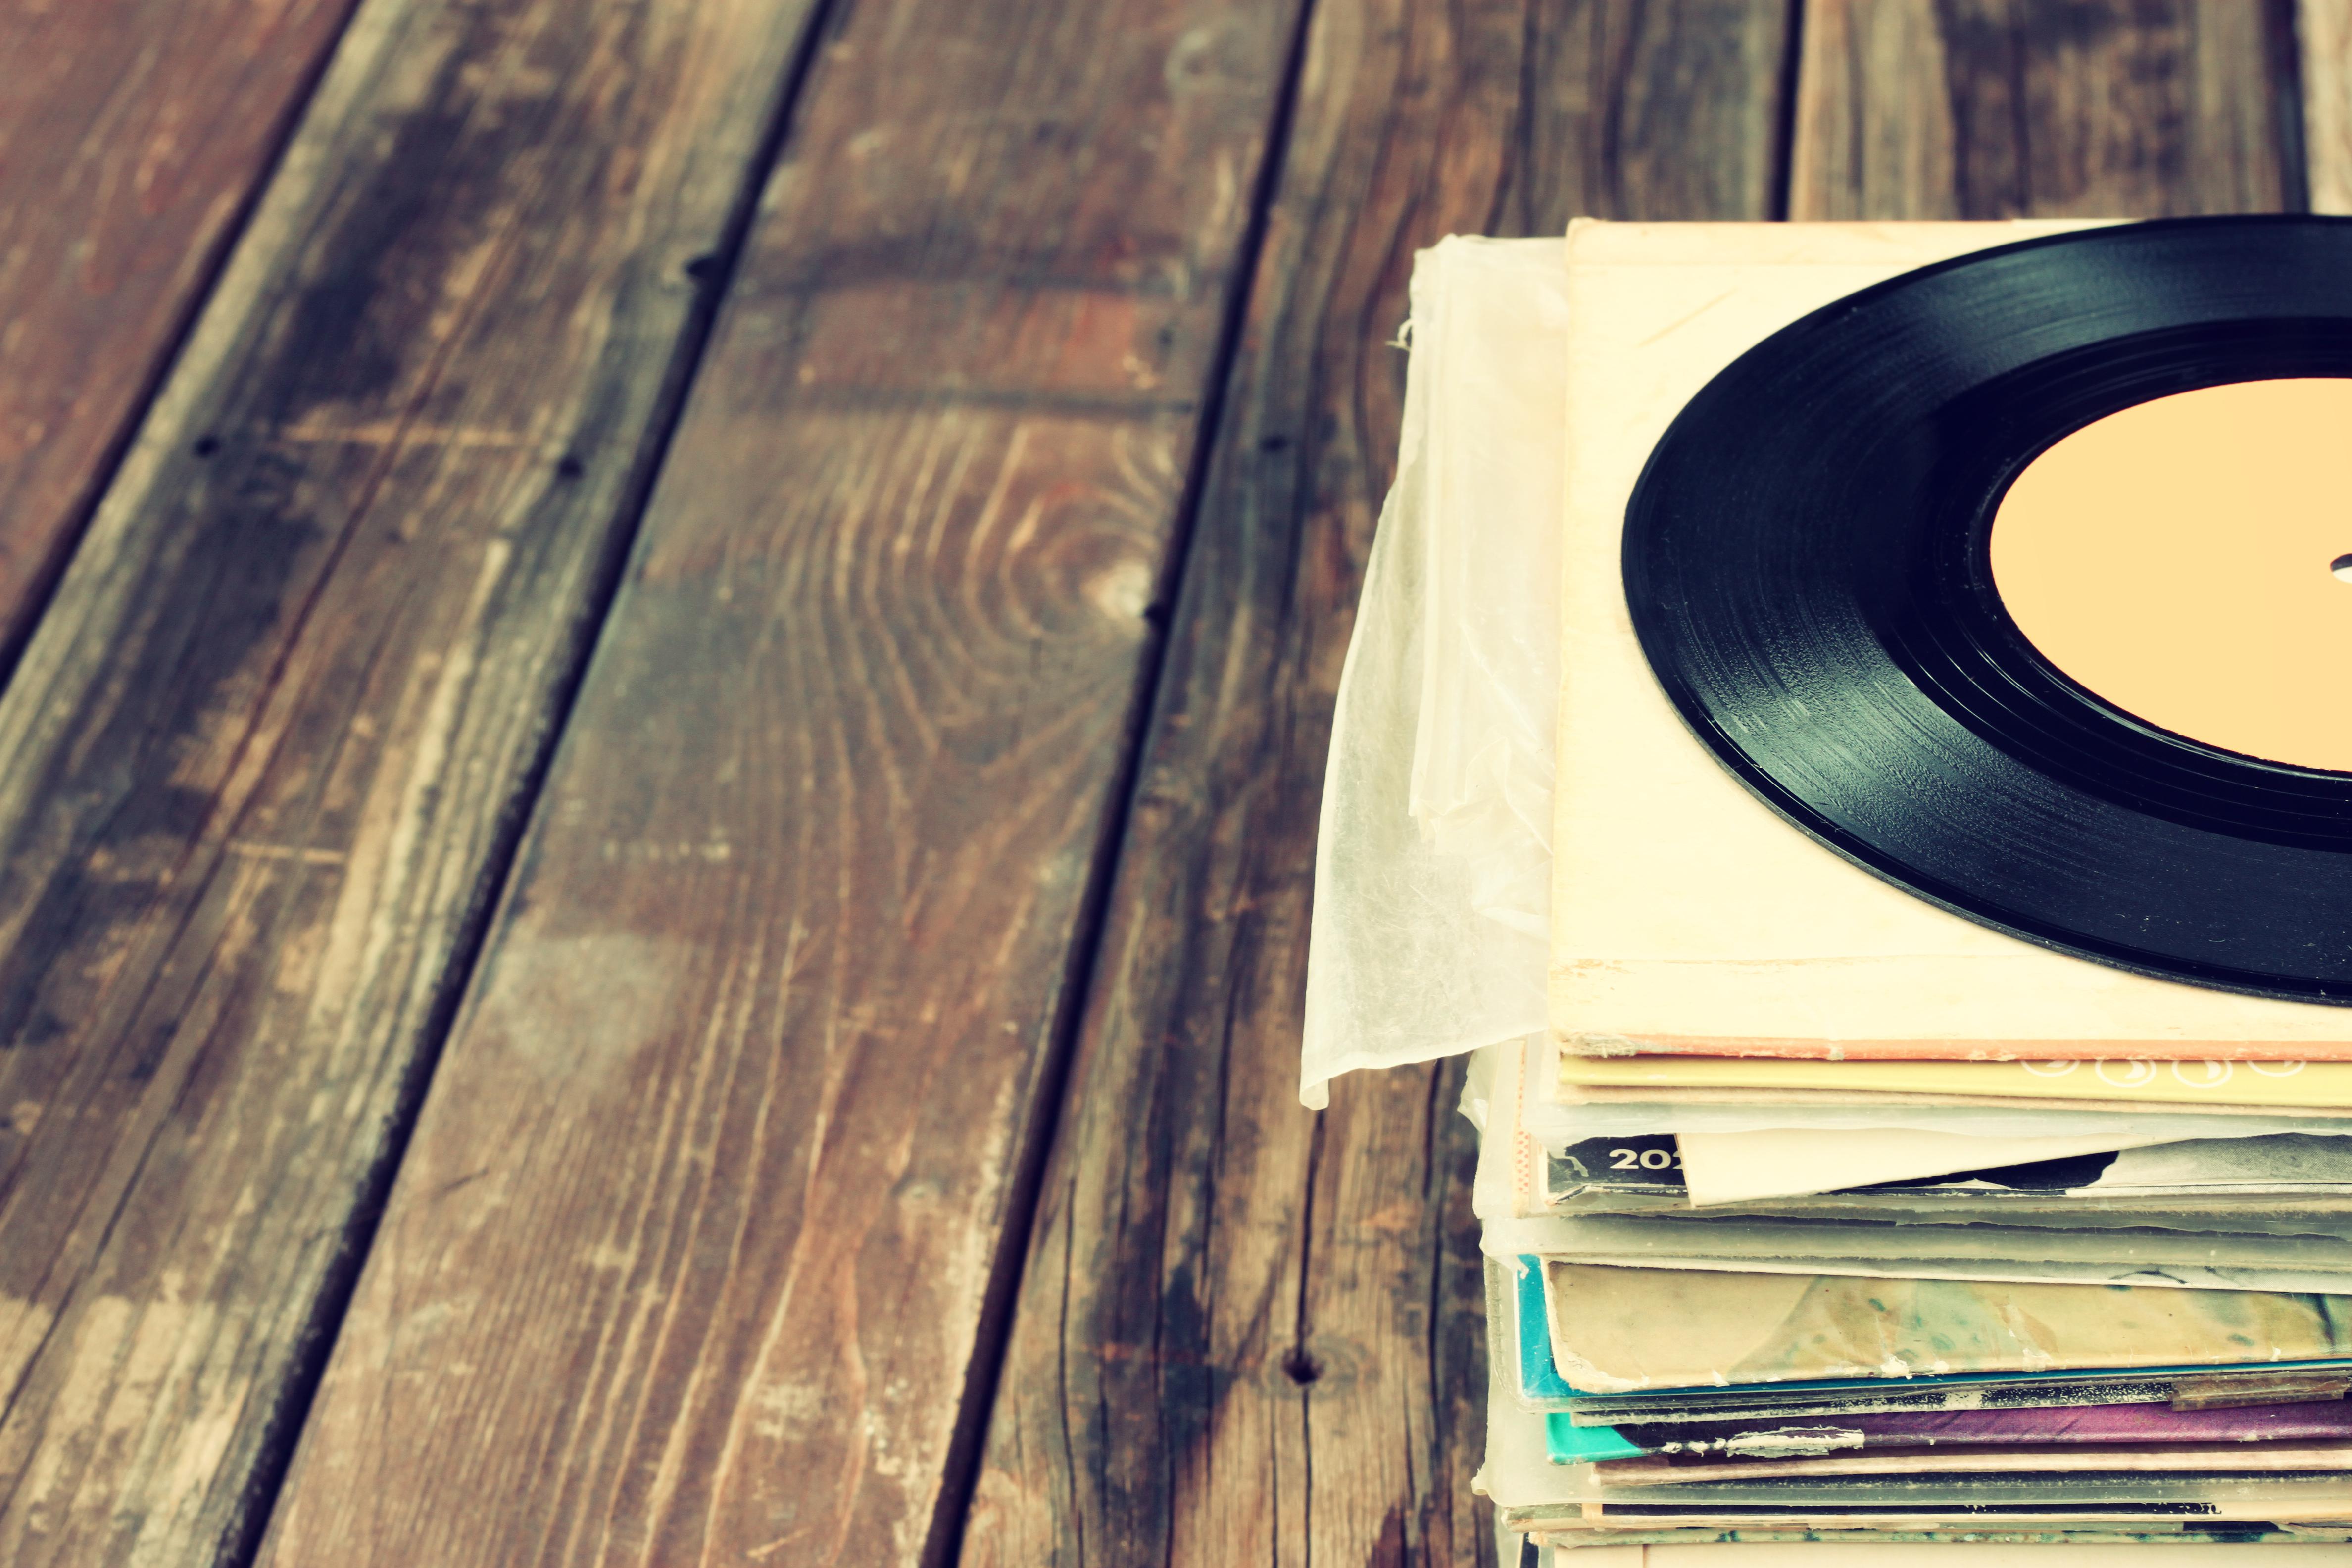 vinyl records stacked on floor